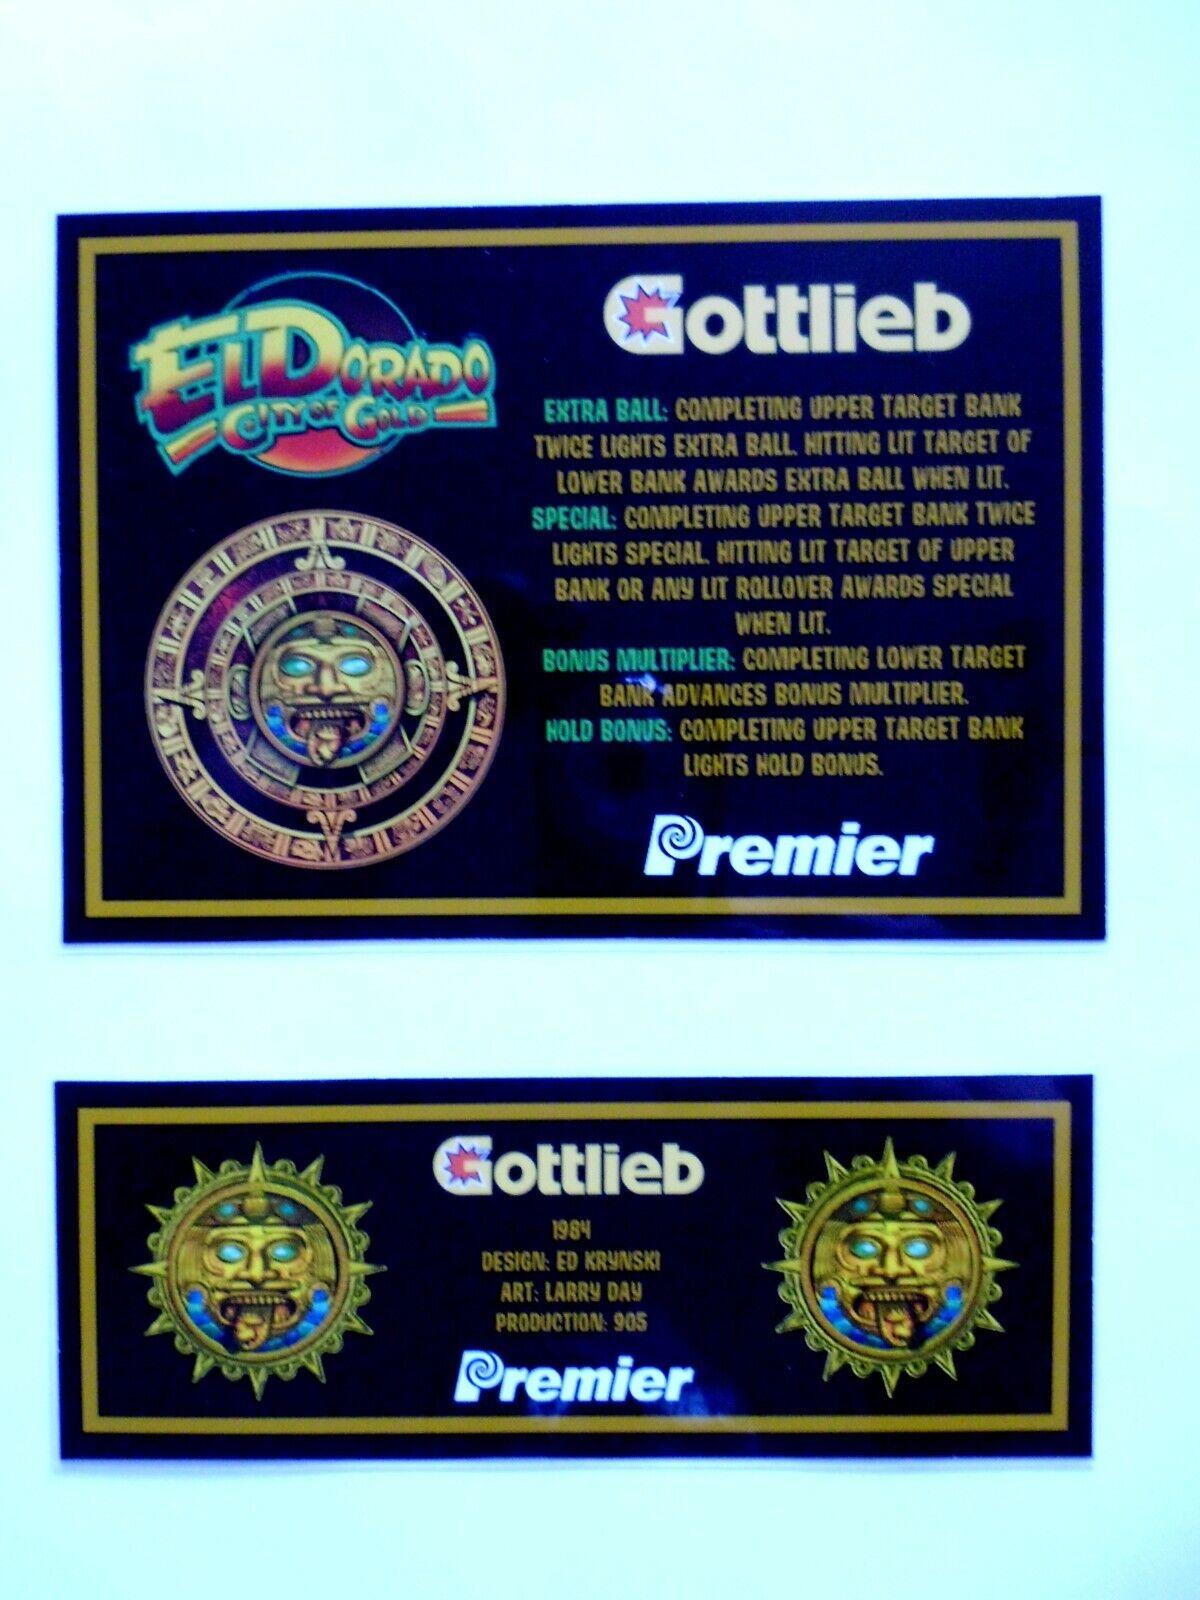 * 'EL DORADO CITY OF GOLD' Gottlieb 1984 Custom Instruction/Apron Cards * (New)